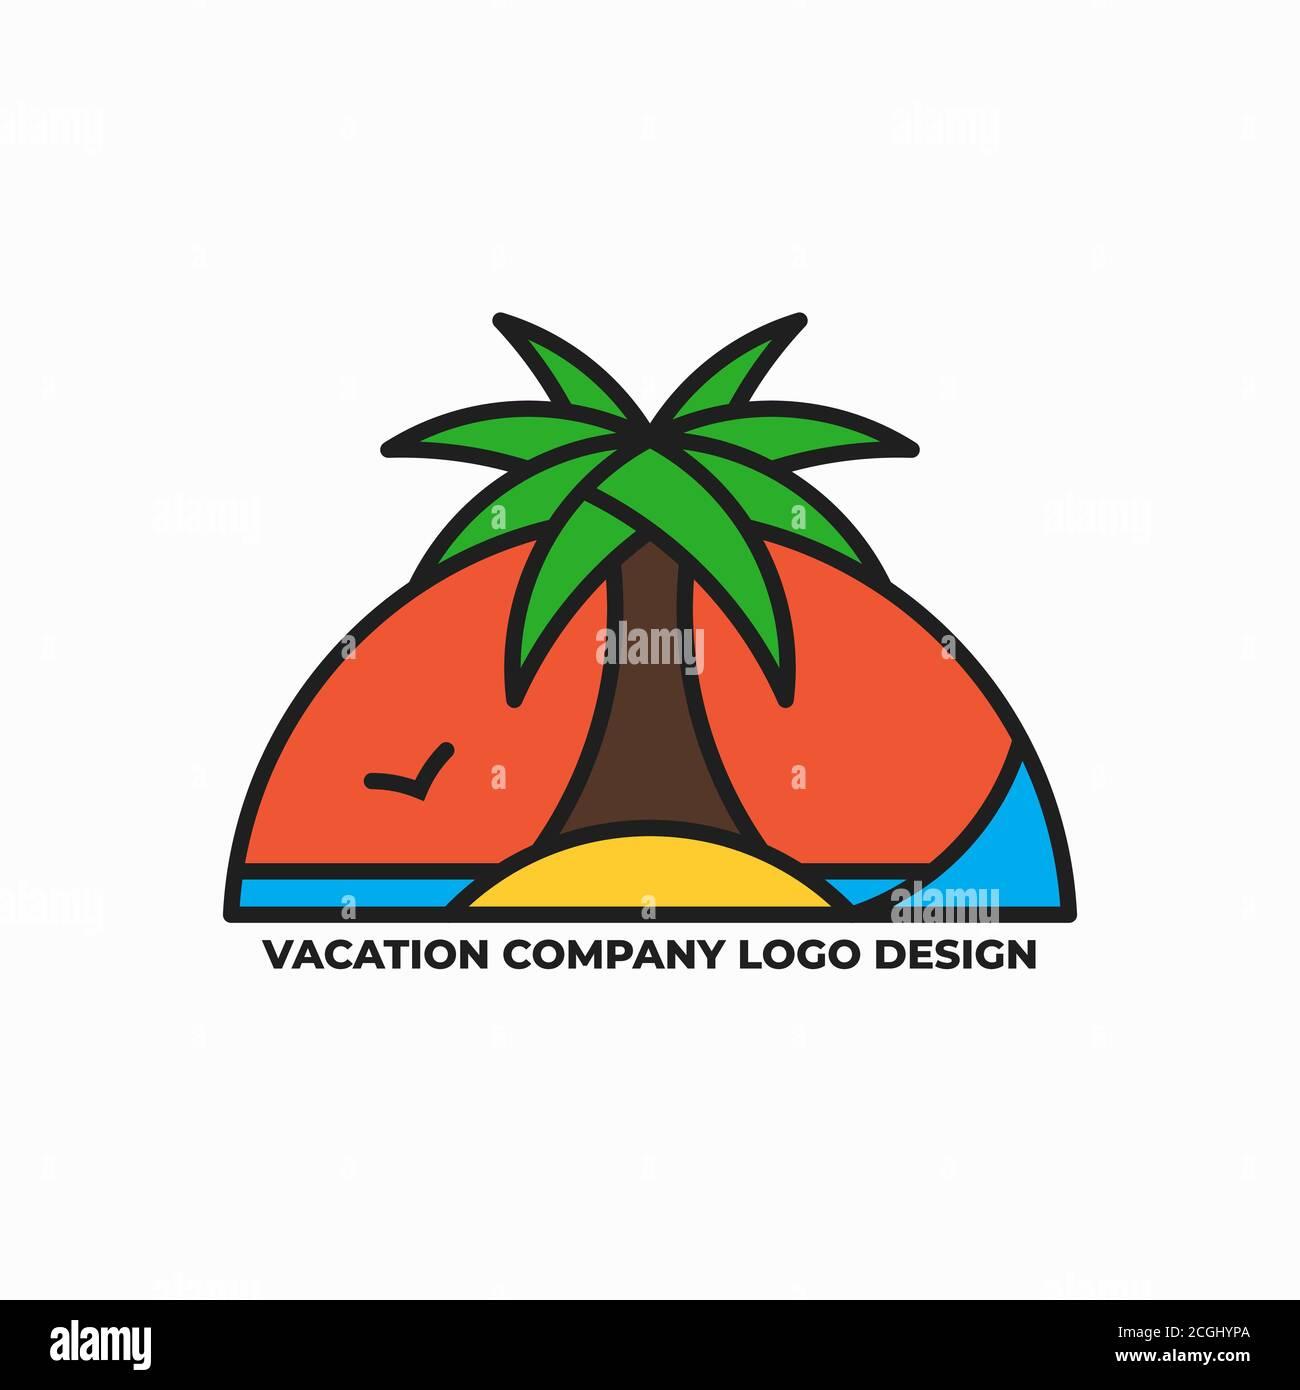 Vacation company logo design template Stock Vector